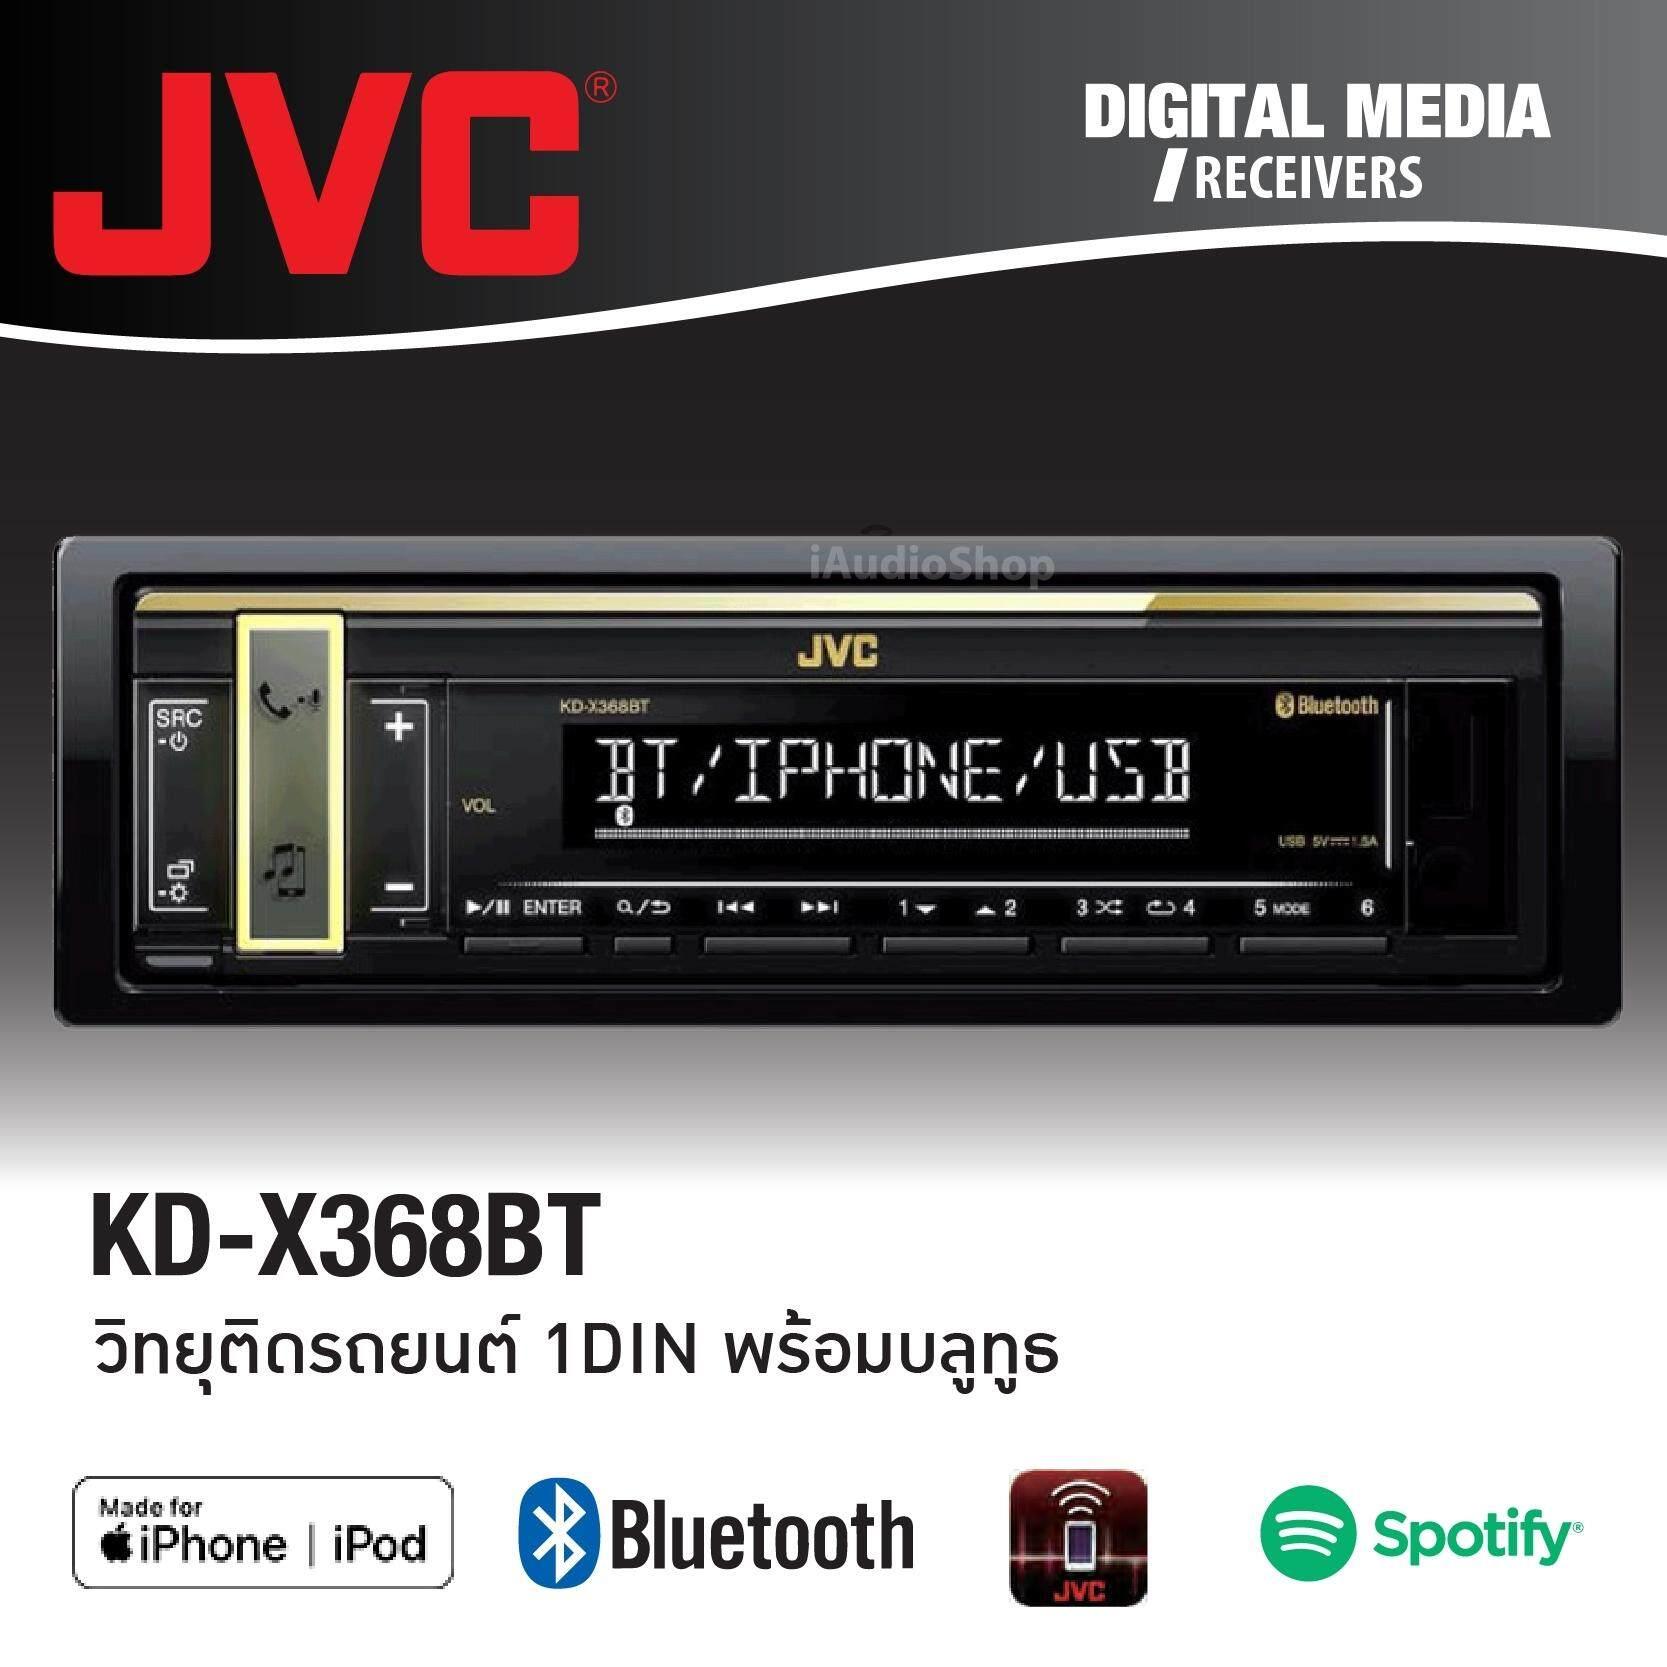 JVC KD-R556 Receiver Drivers Download